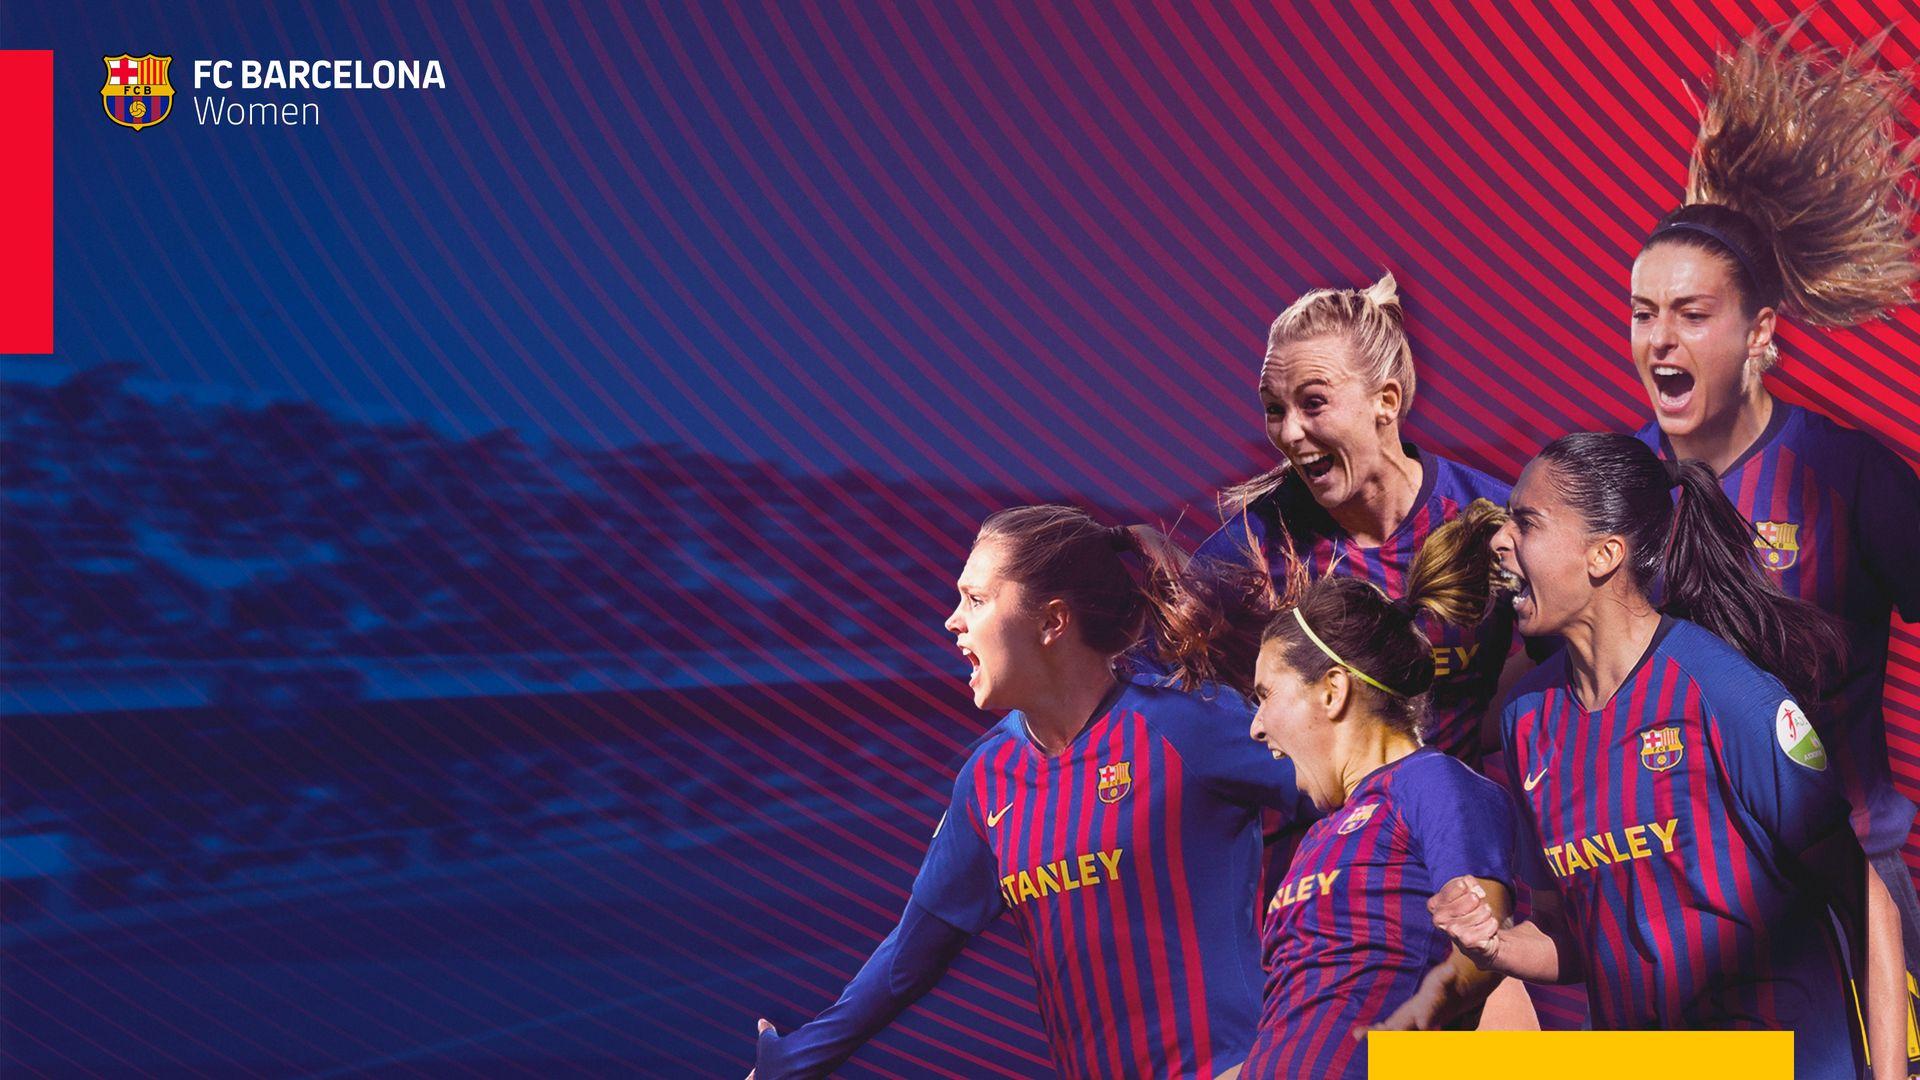 31+ FC Barcelona 2020 Wallpapers on WallpaperSafari